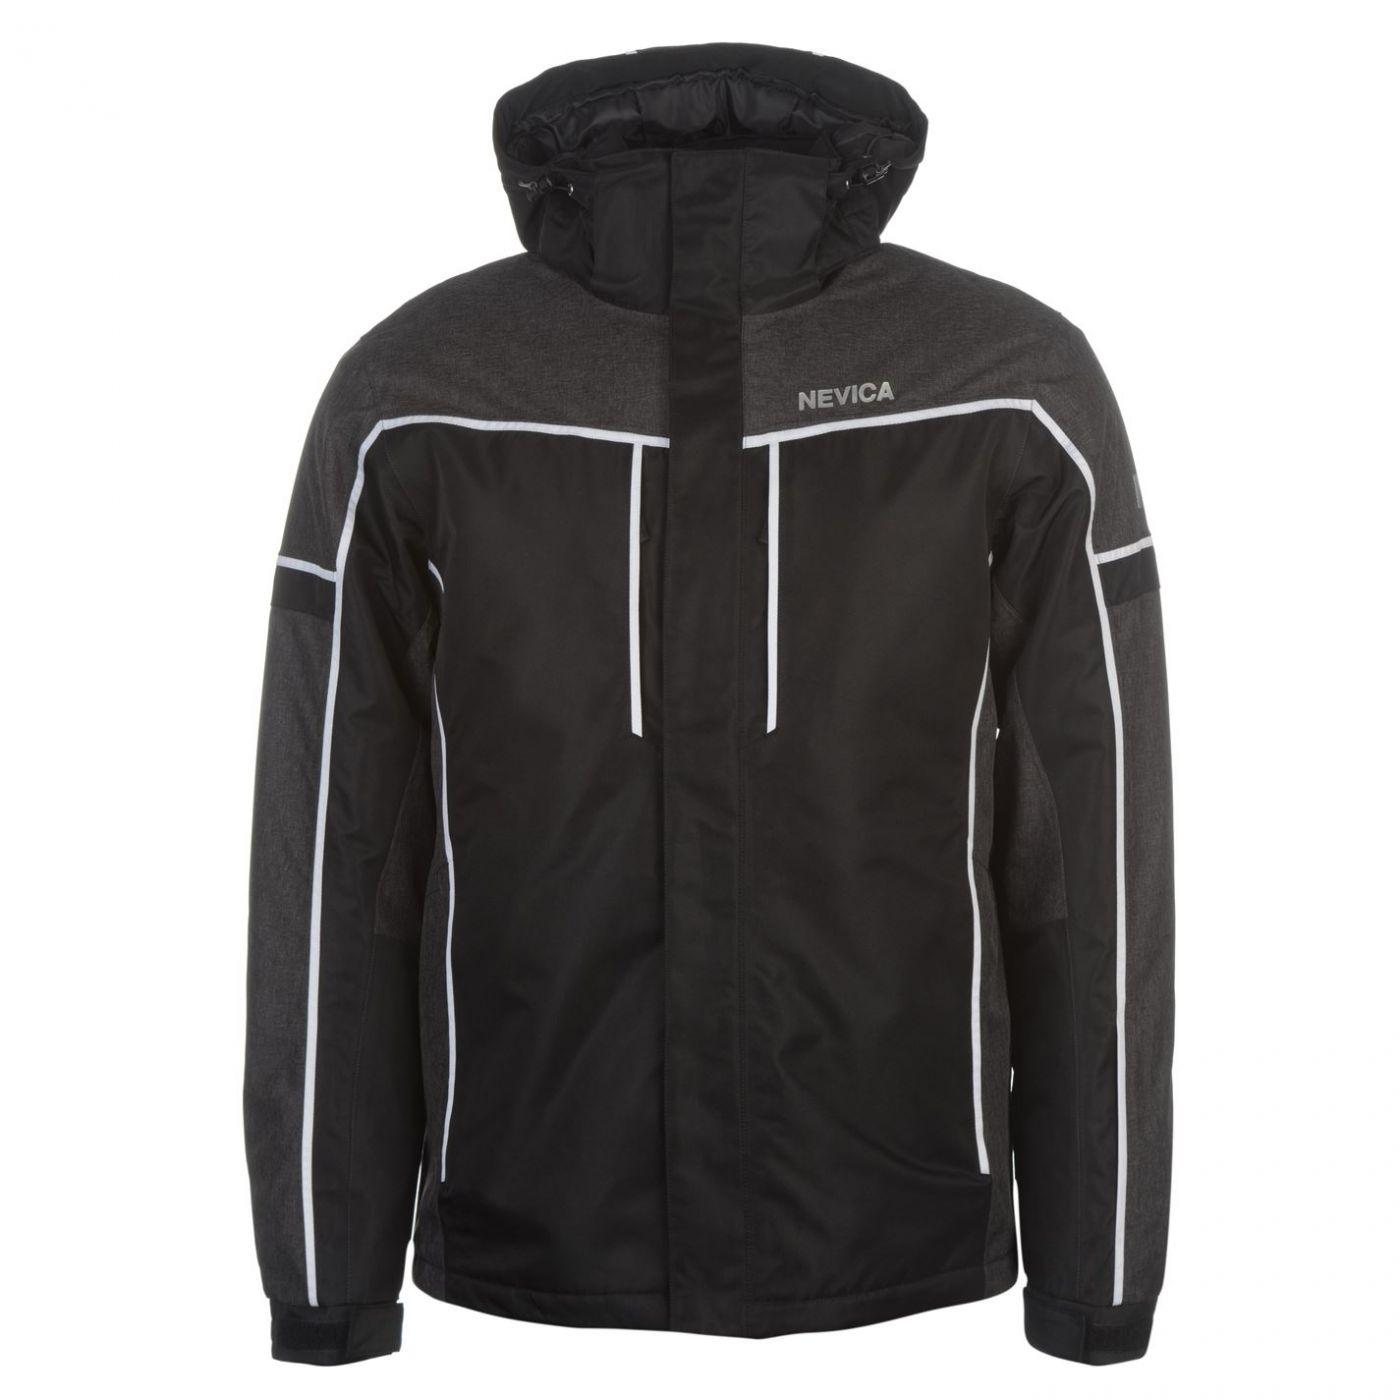 a9959a4925 Nevica Meribel Ski Jacket Mens - FACTCOOL